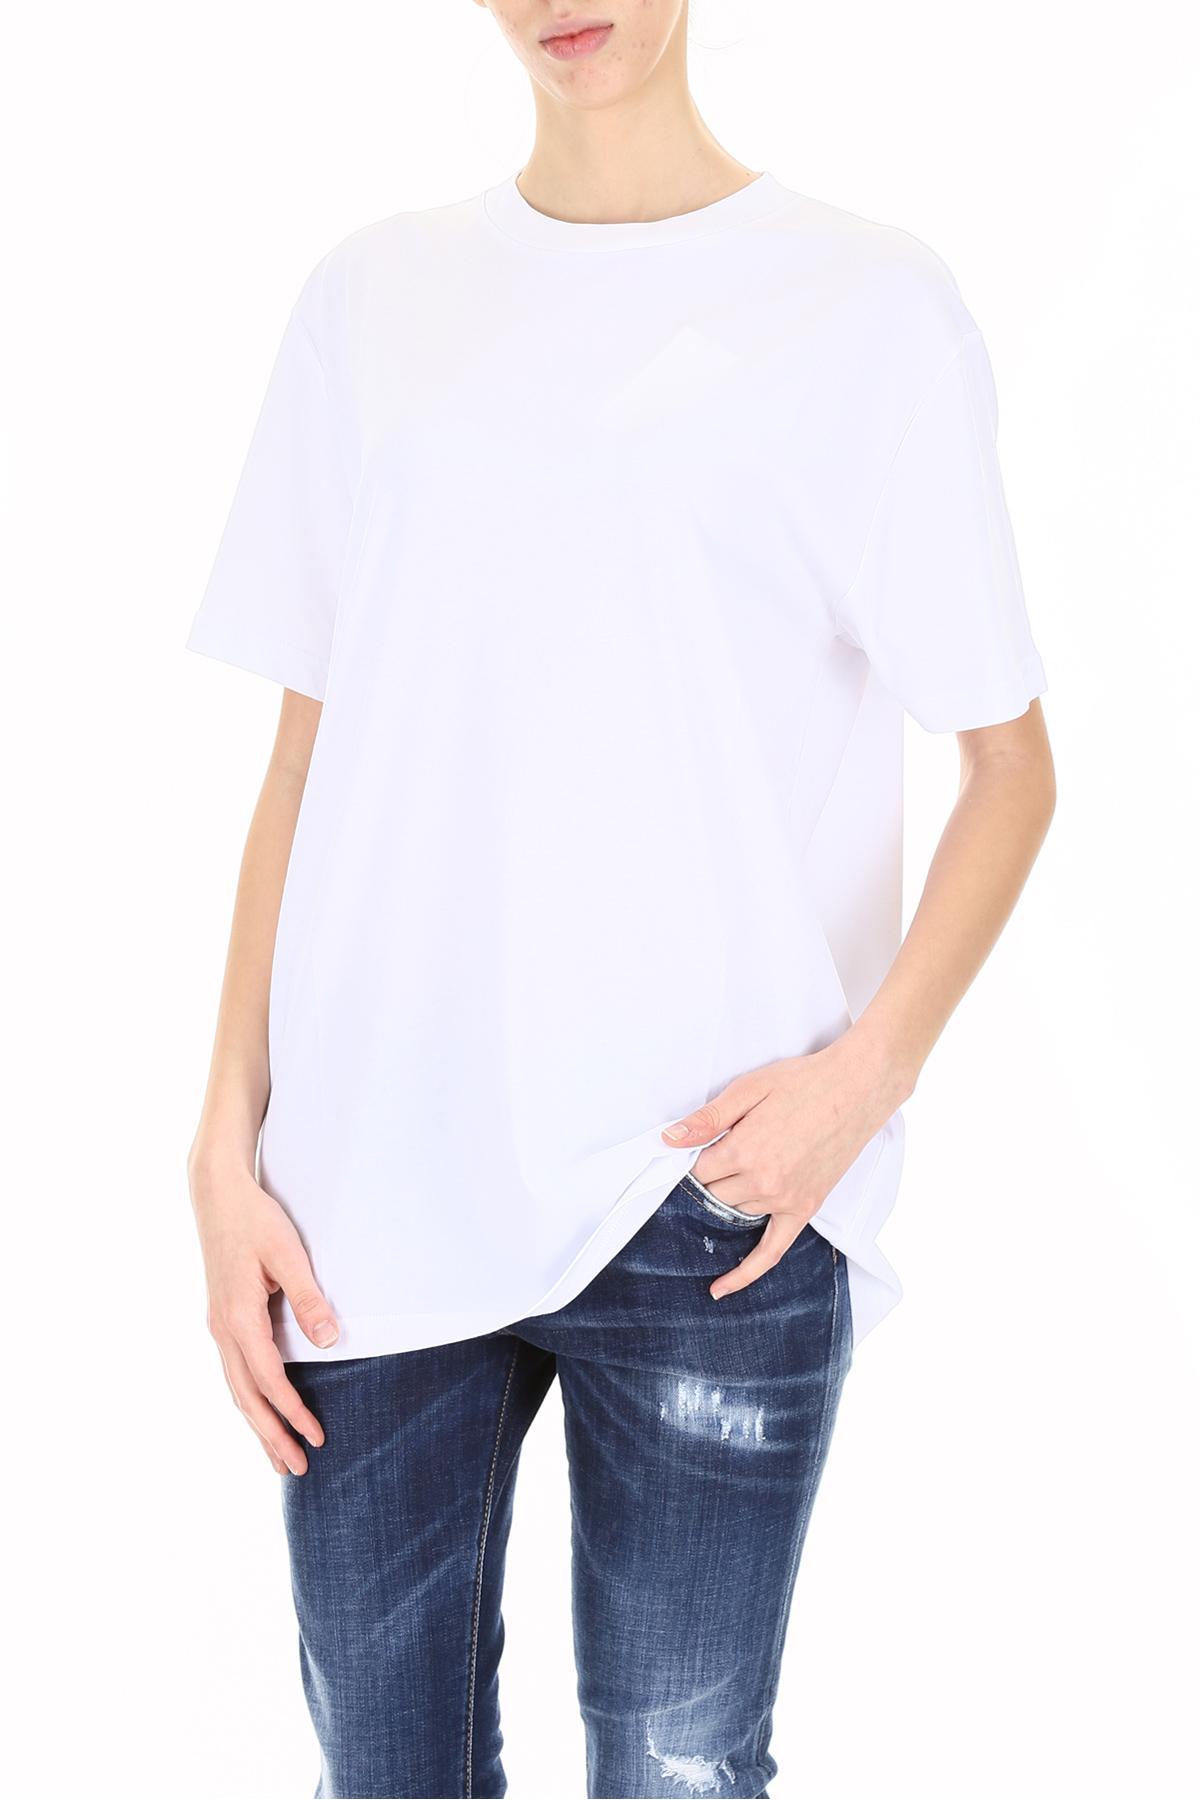 Shirt Blvd Halcyon 1017 Lyst White For Men T In Alyx 9sm OZiuPkX